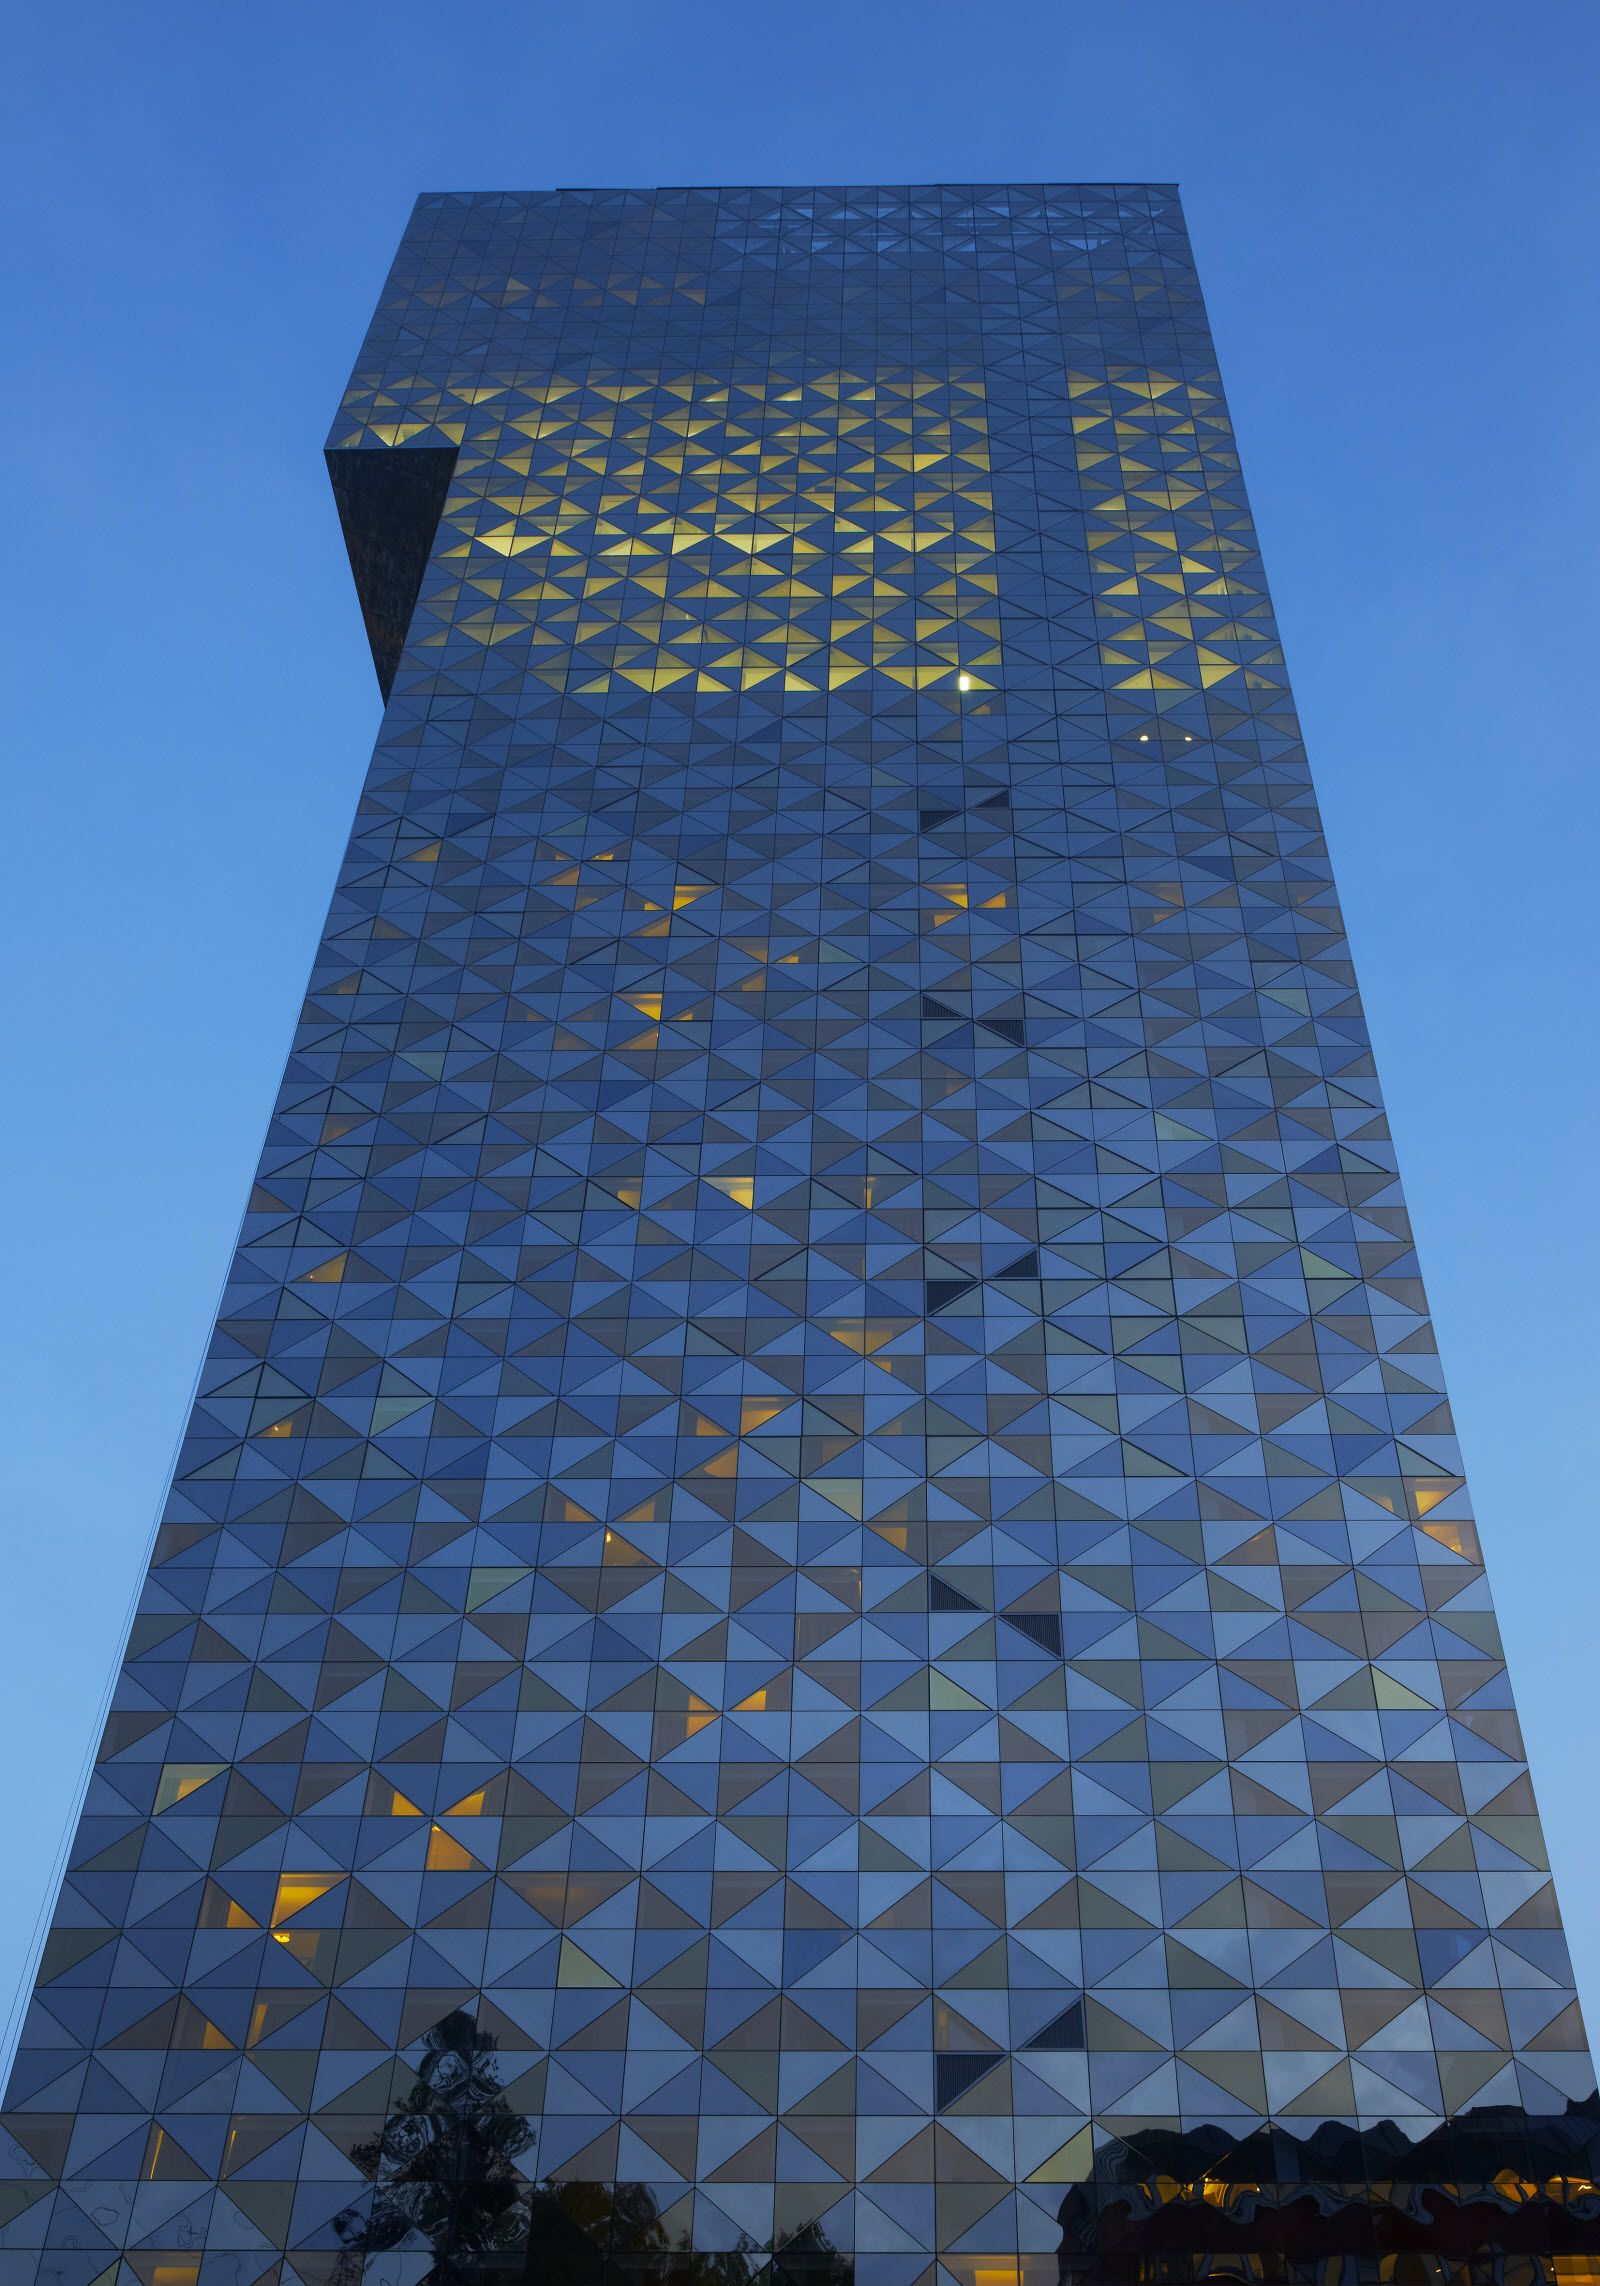 Scandic-Victoria-Tower-facade-2.jpg (1600×2286)